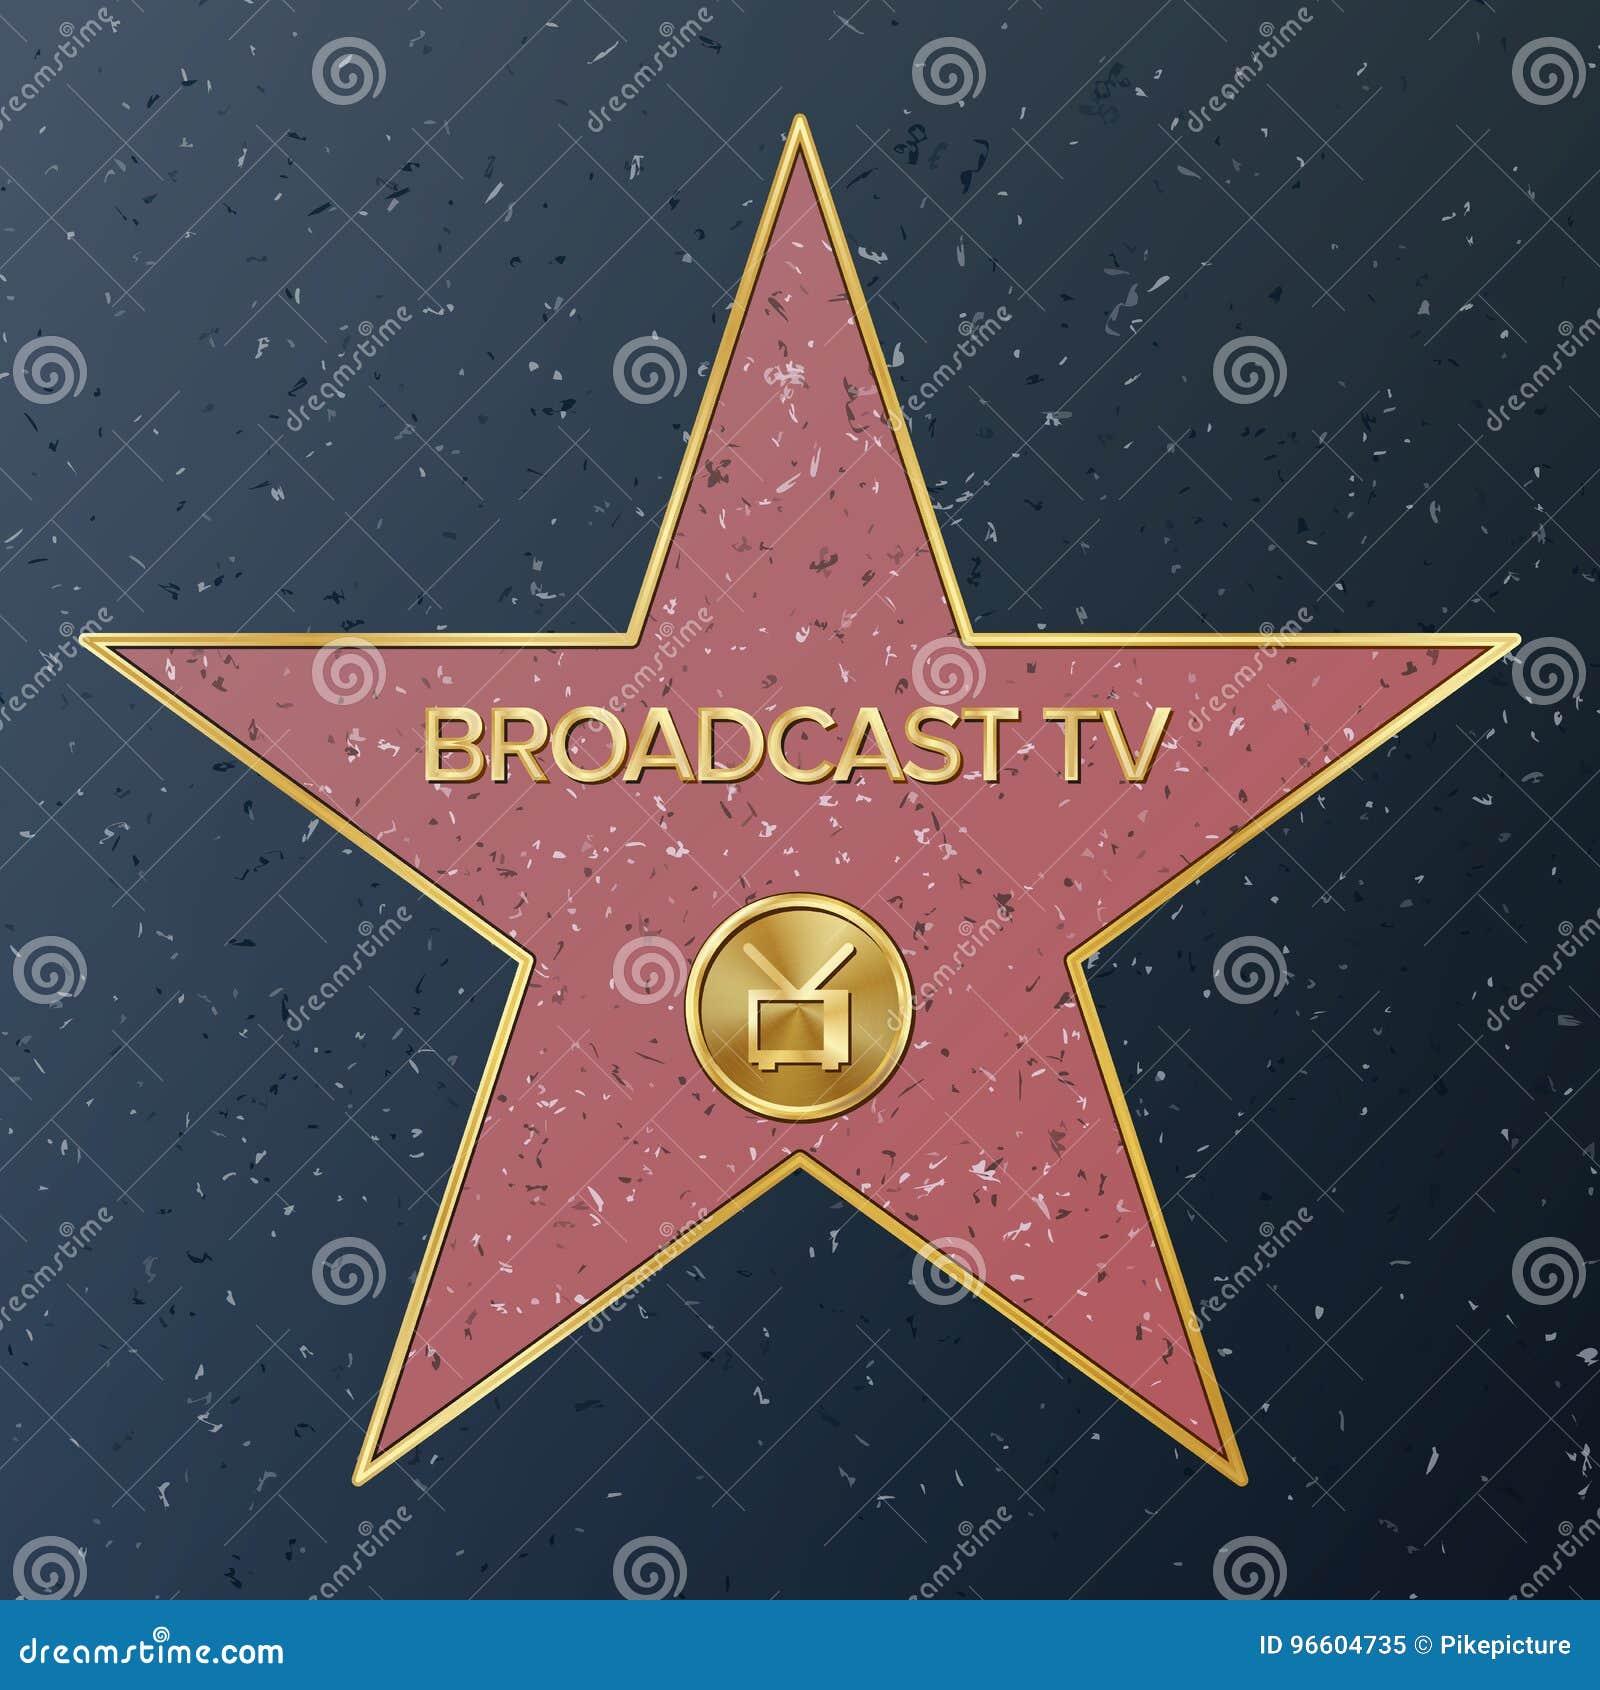 Hollywood Walk Of Fame. Vector Star Illustration. Famous Sidewalk Boulevard. Television Receiver Representing Broadcast